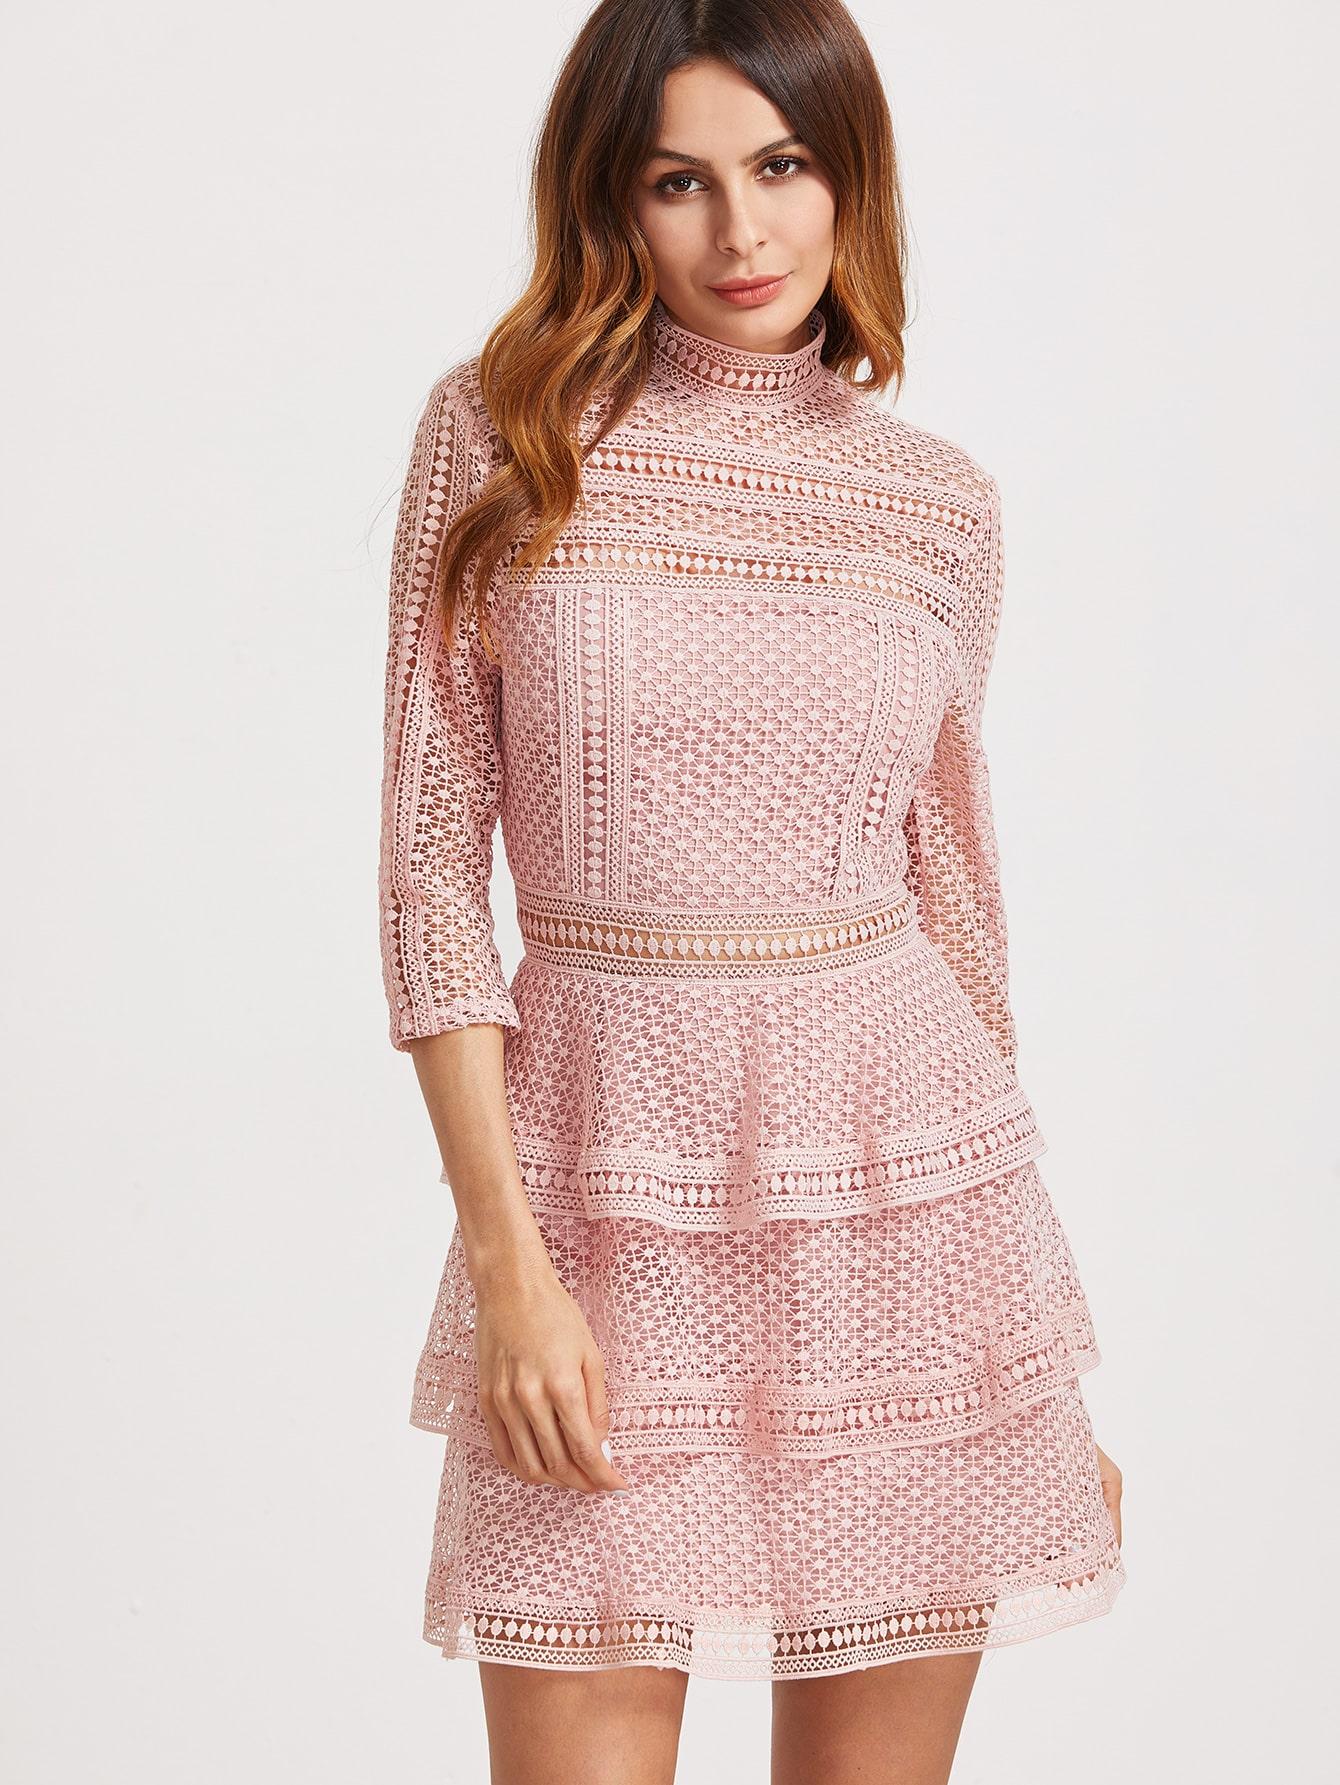 DRESSES - 3/4 length dresses Croch Clearance Free Shipping j1tnz